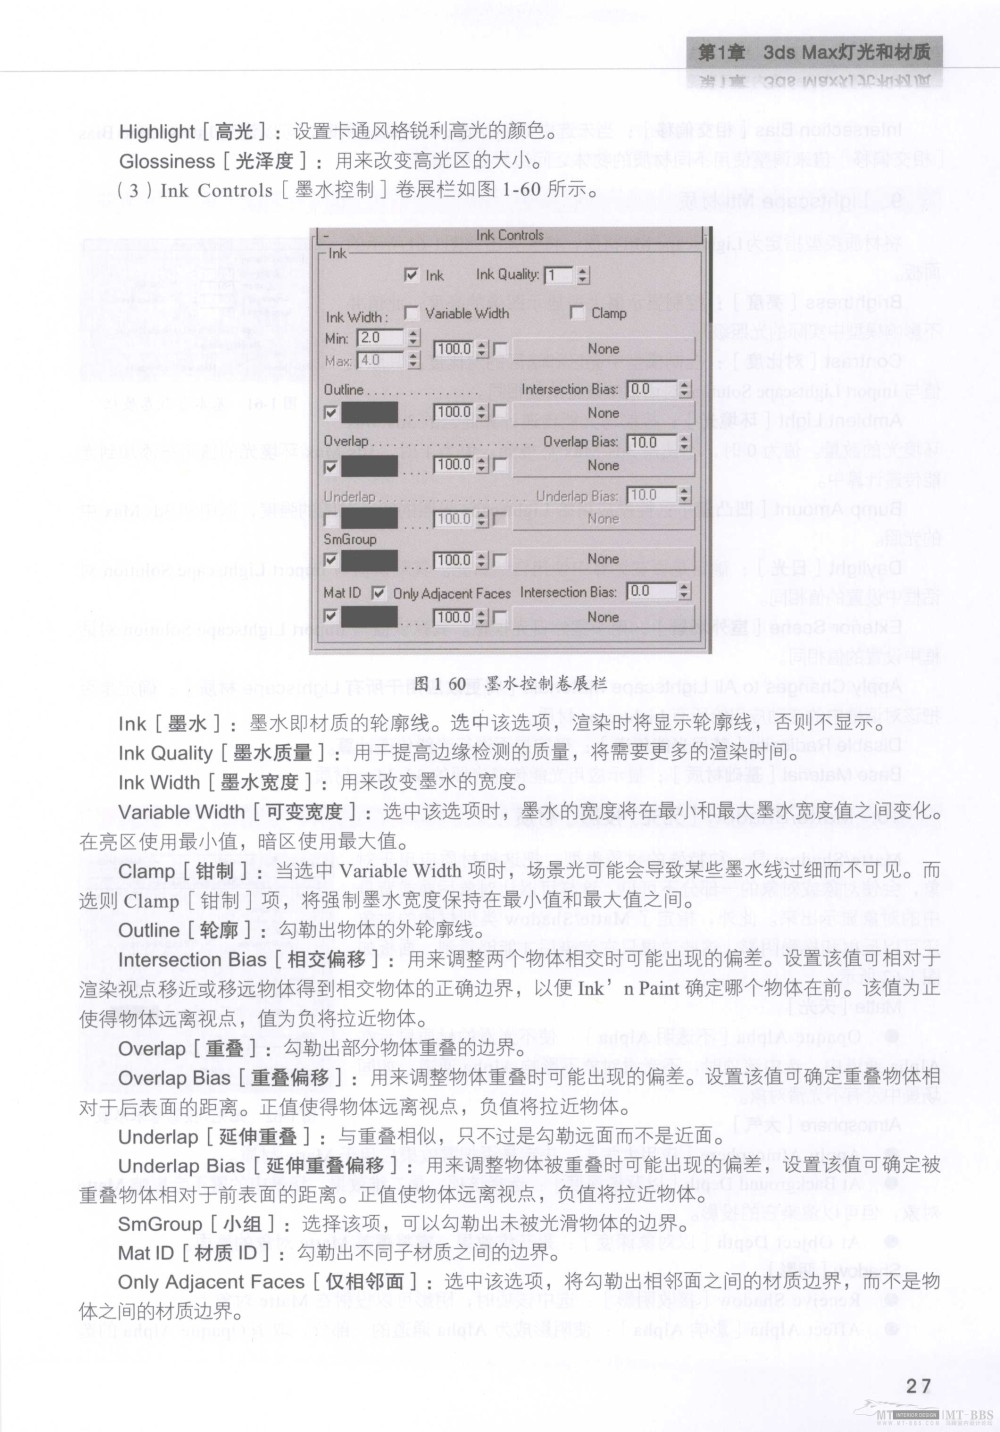 水晶石技法-3ds_Max&VRay室内空间表现_水晶石技法-3ds_Max&VRay室内空间表现_页面_033.jpg